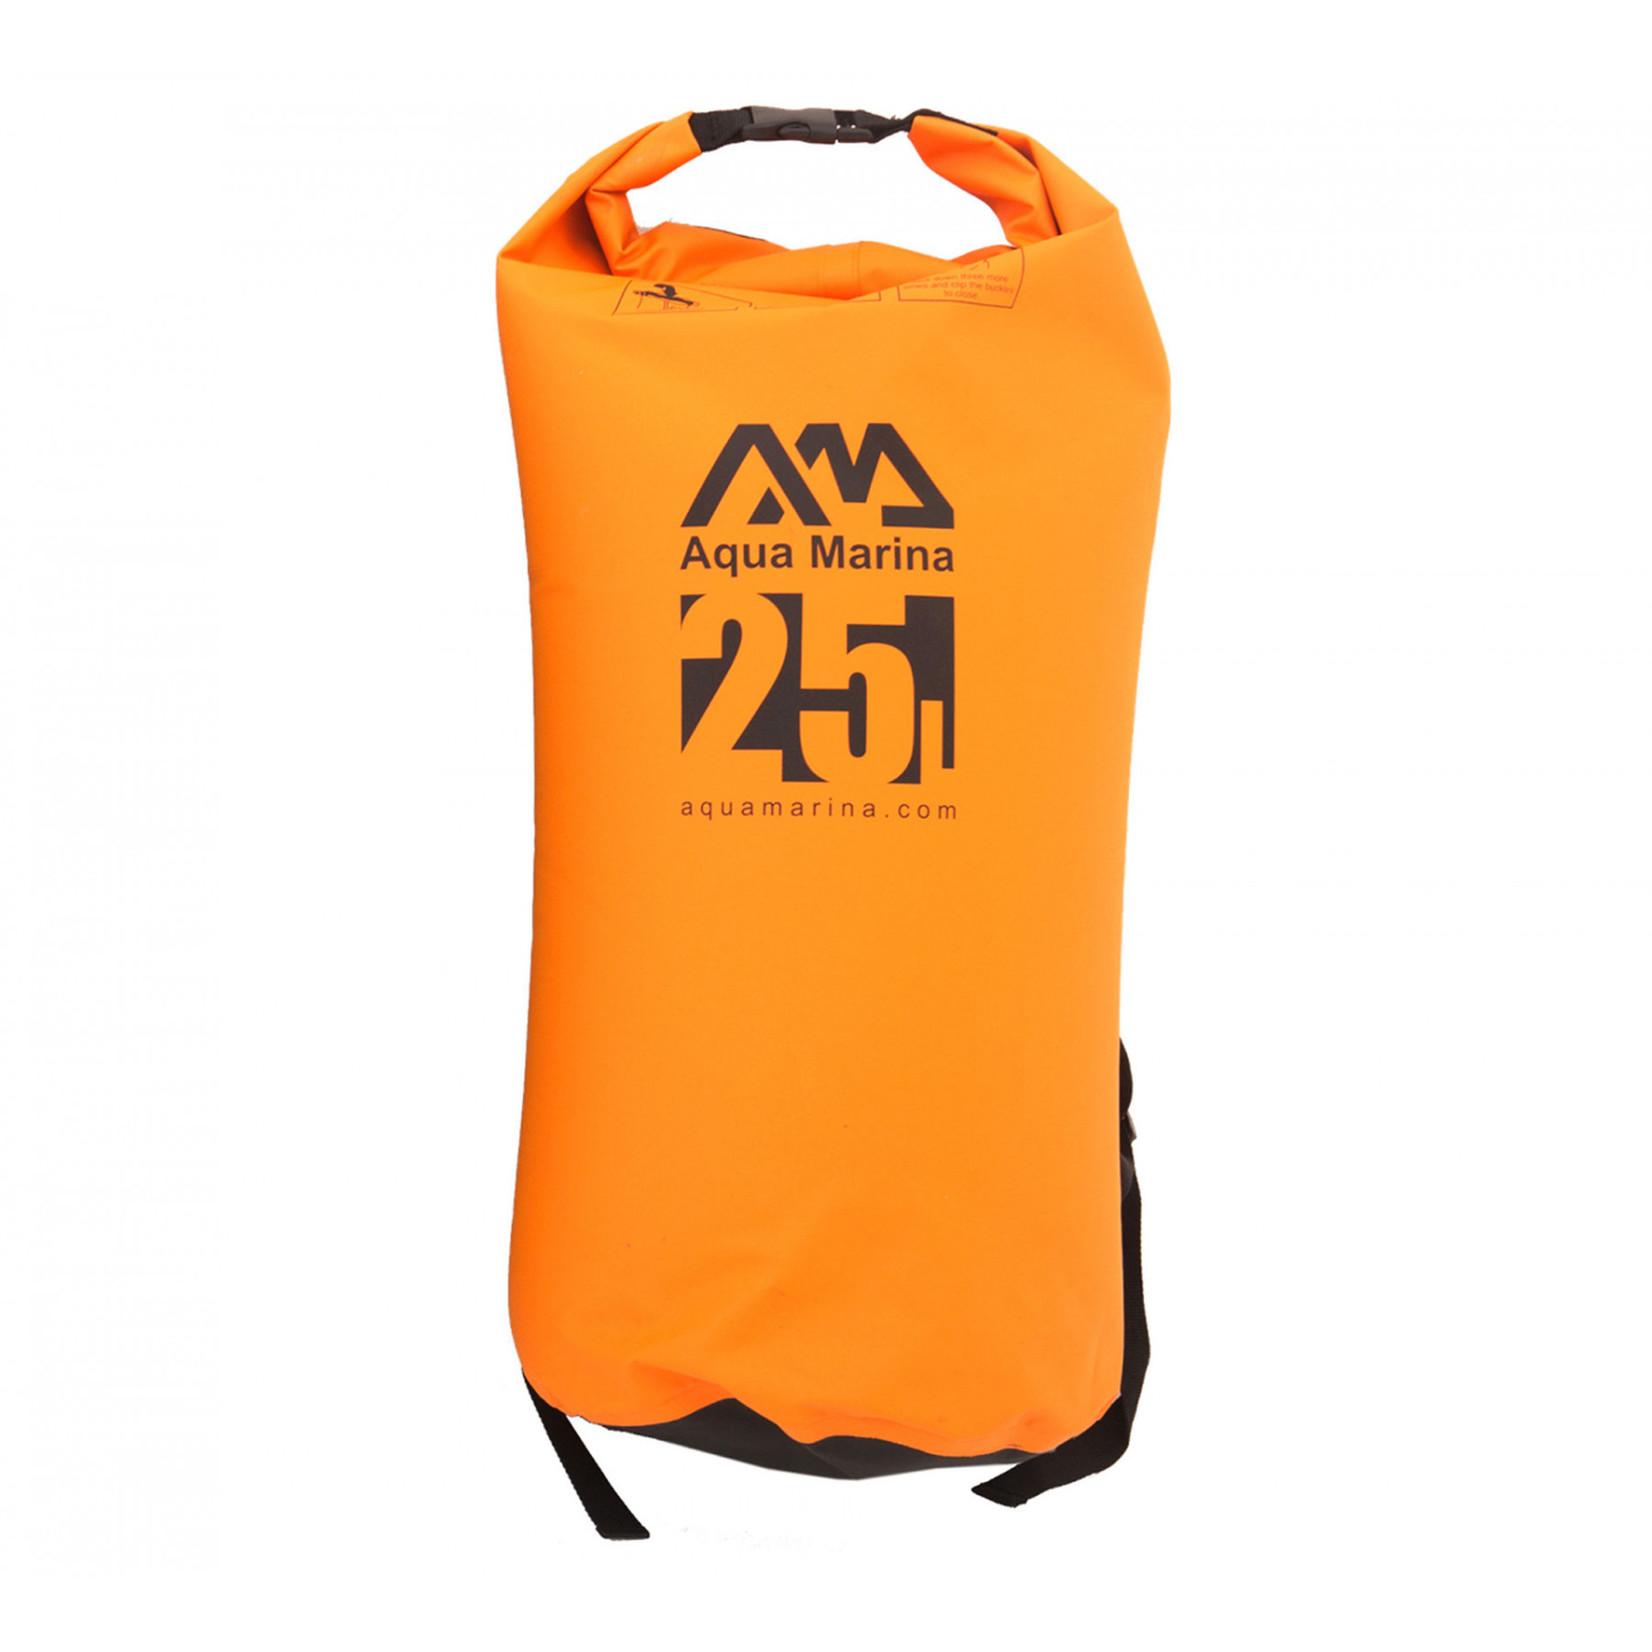 Aqua Marina Backpack 25L - Dry